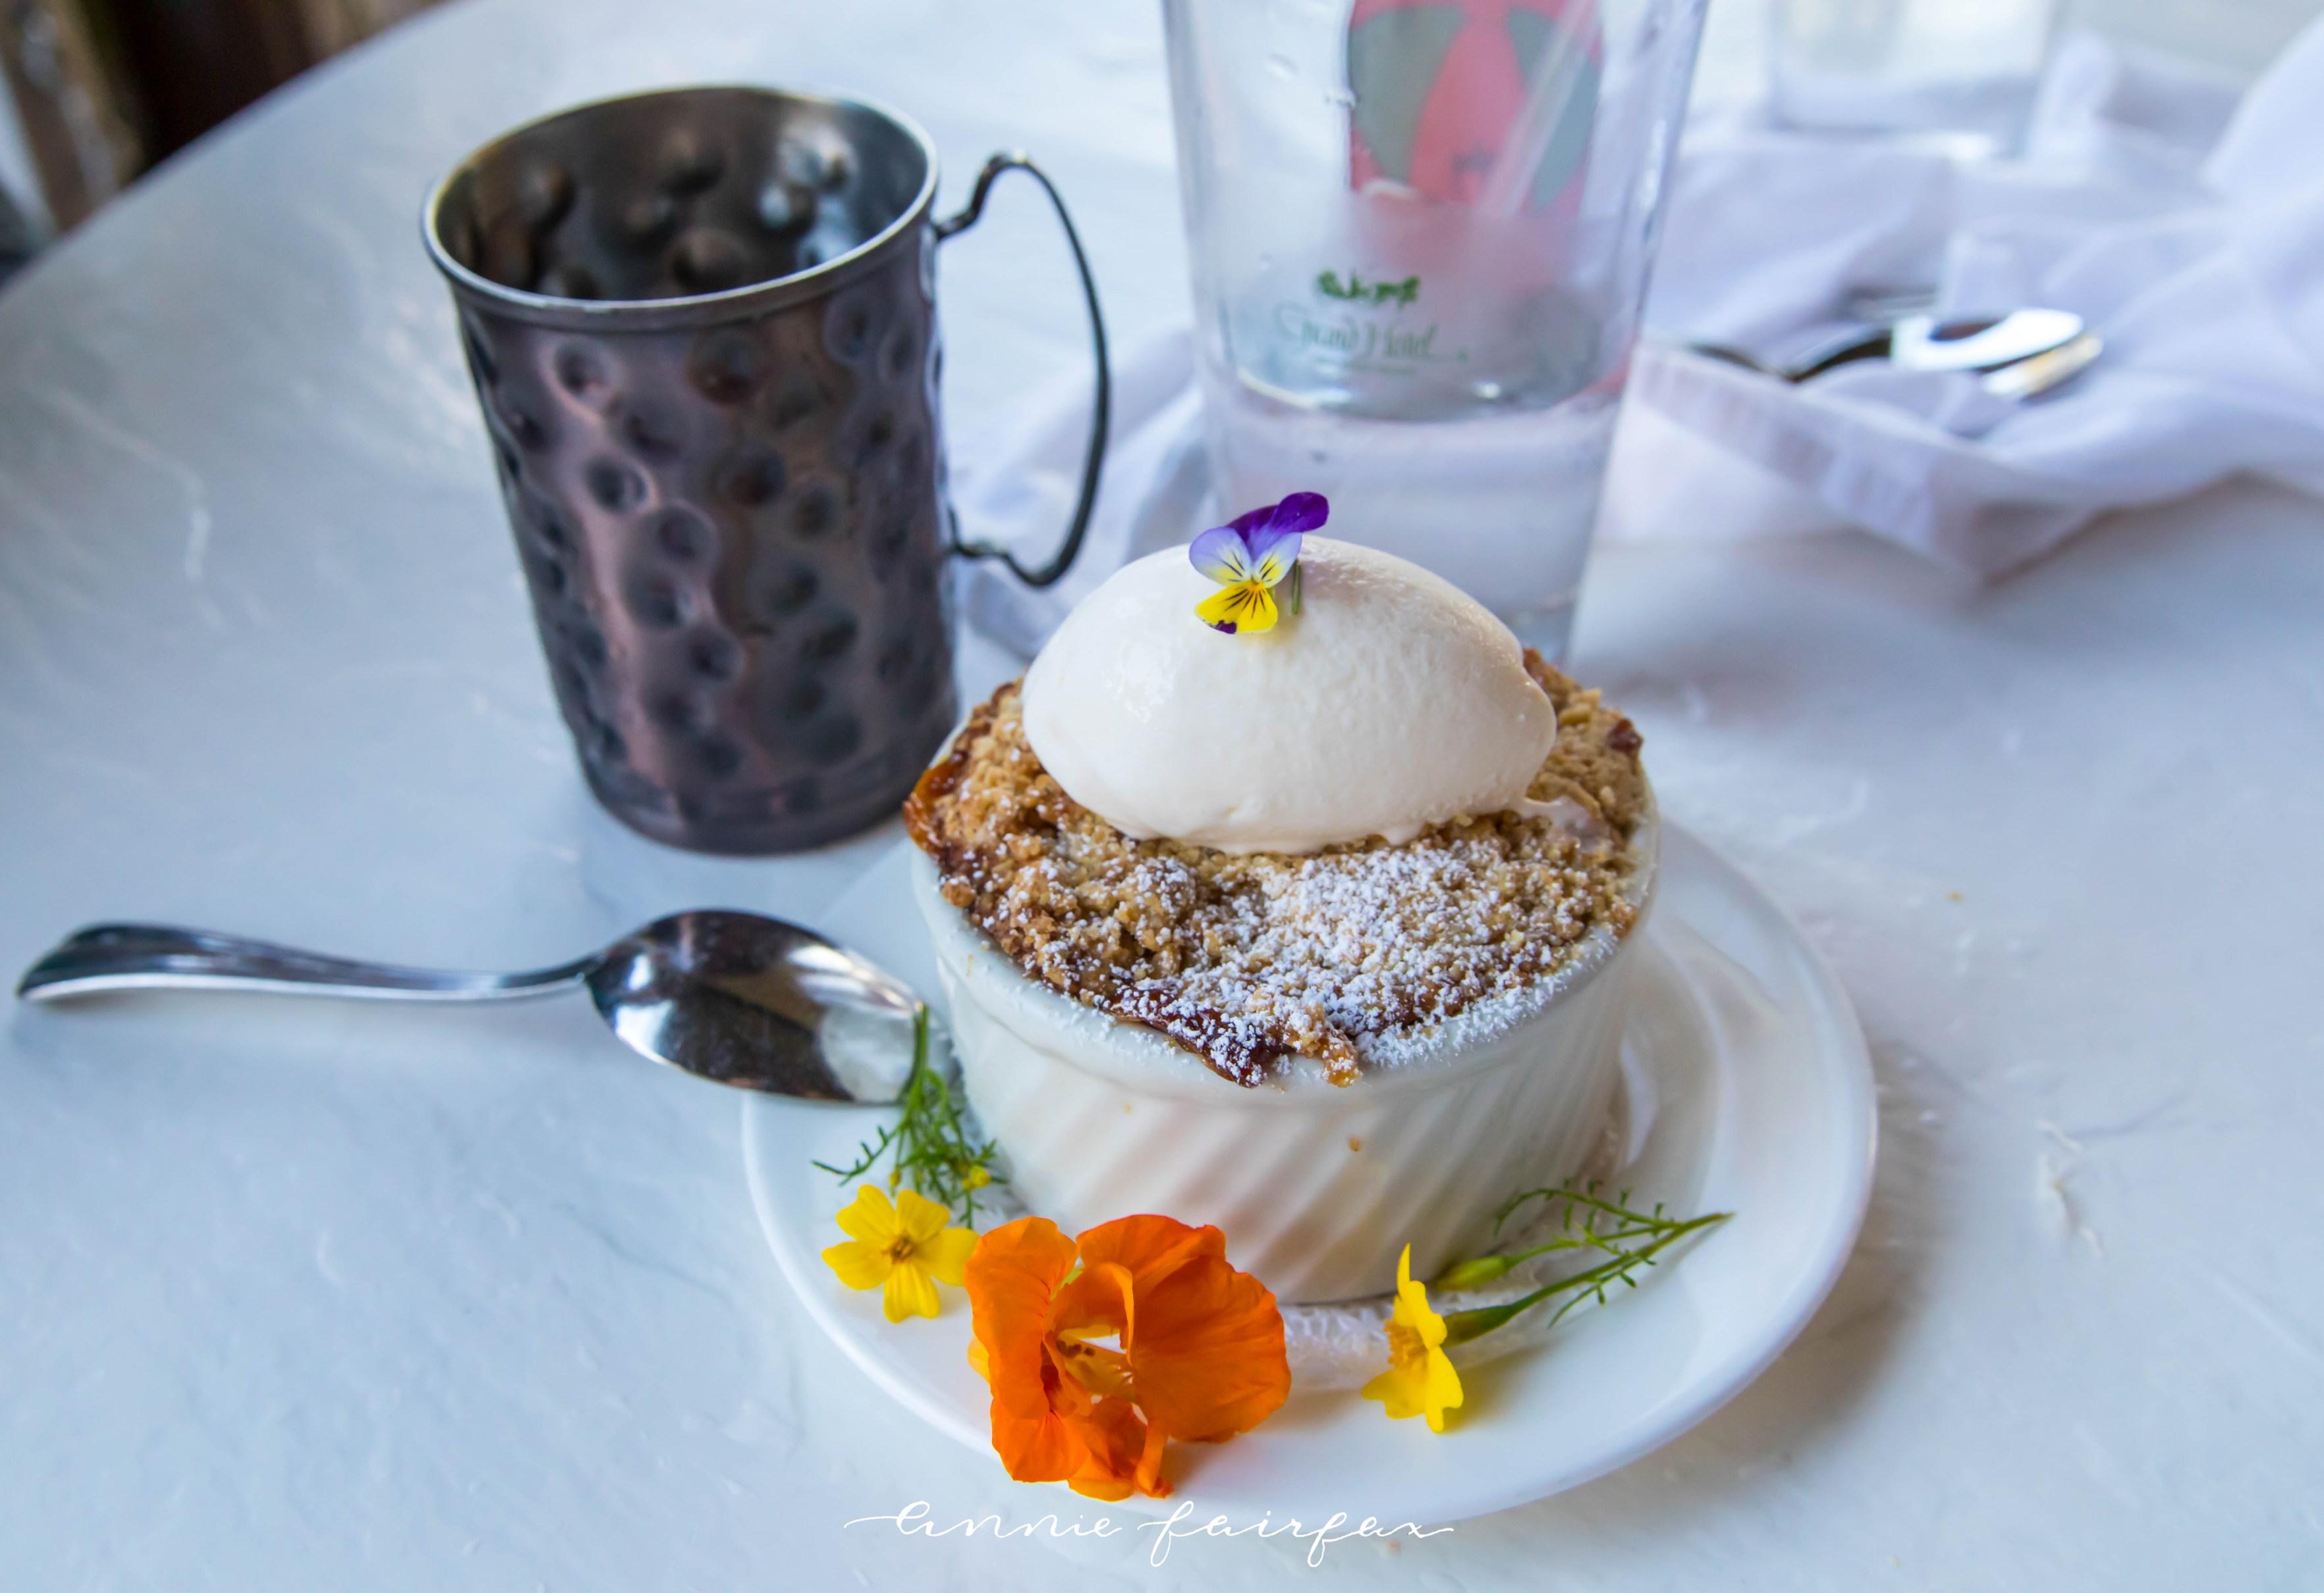 Peach Cobbler Jockey Club Restaurant Grand Hotel Mackinac Island Grand Hotel Dining 5 Course Dinner Mackinac Island